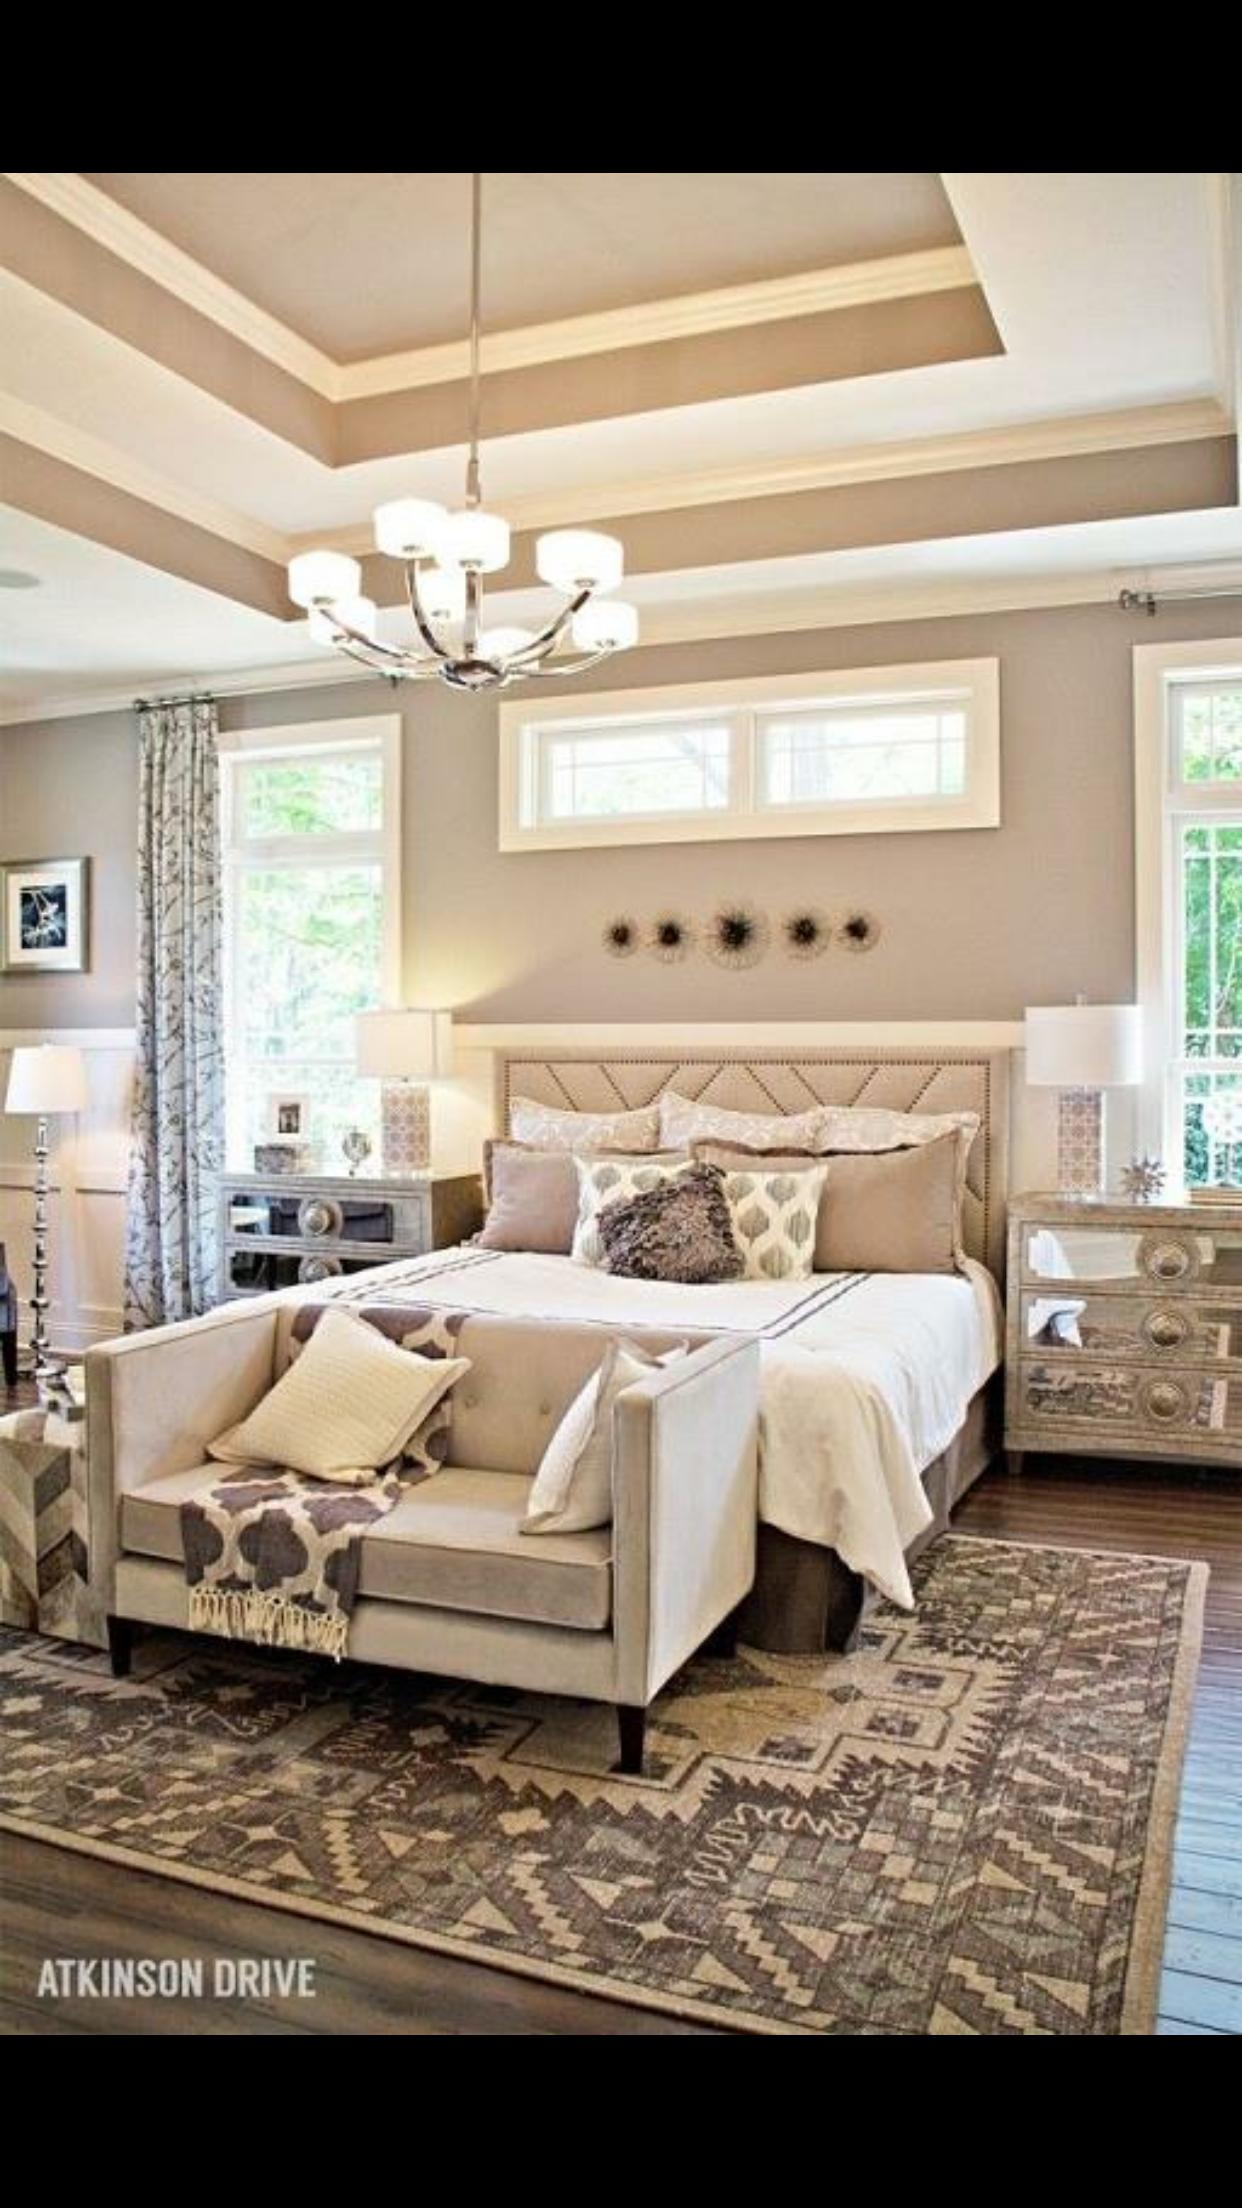 Master bedroom inspiration image by Cynthia Berkley